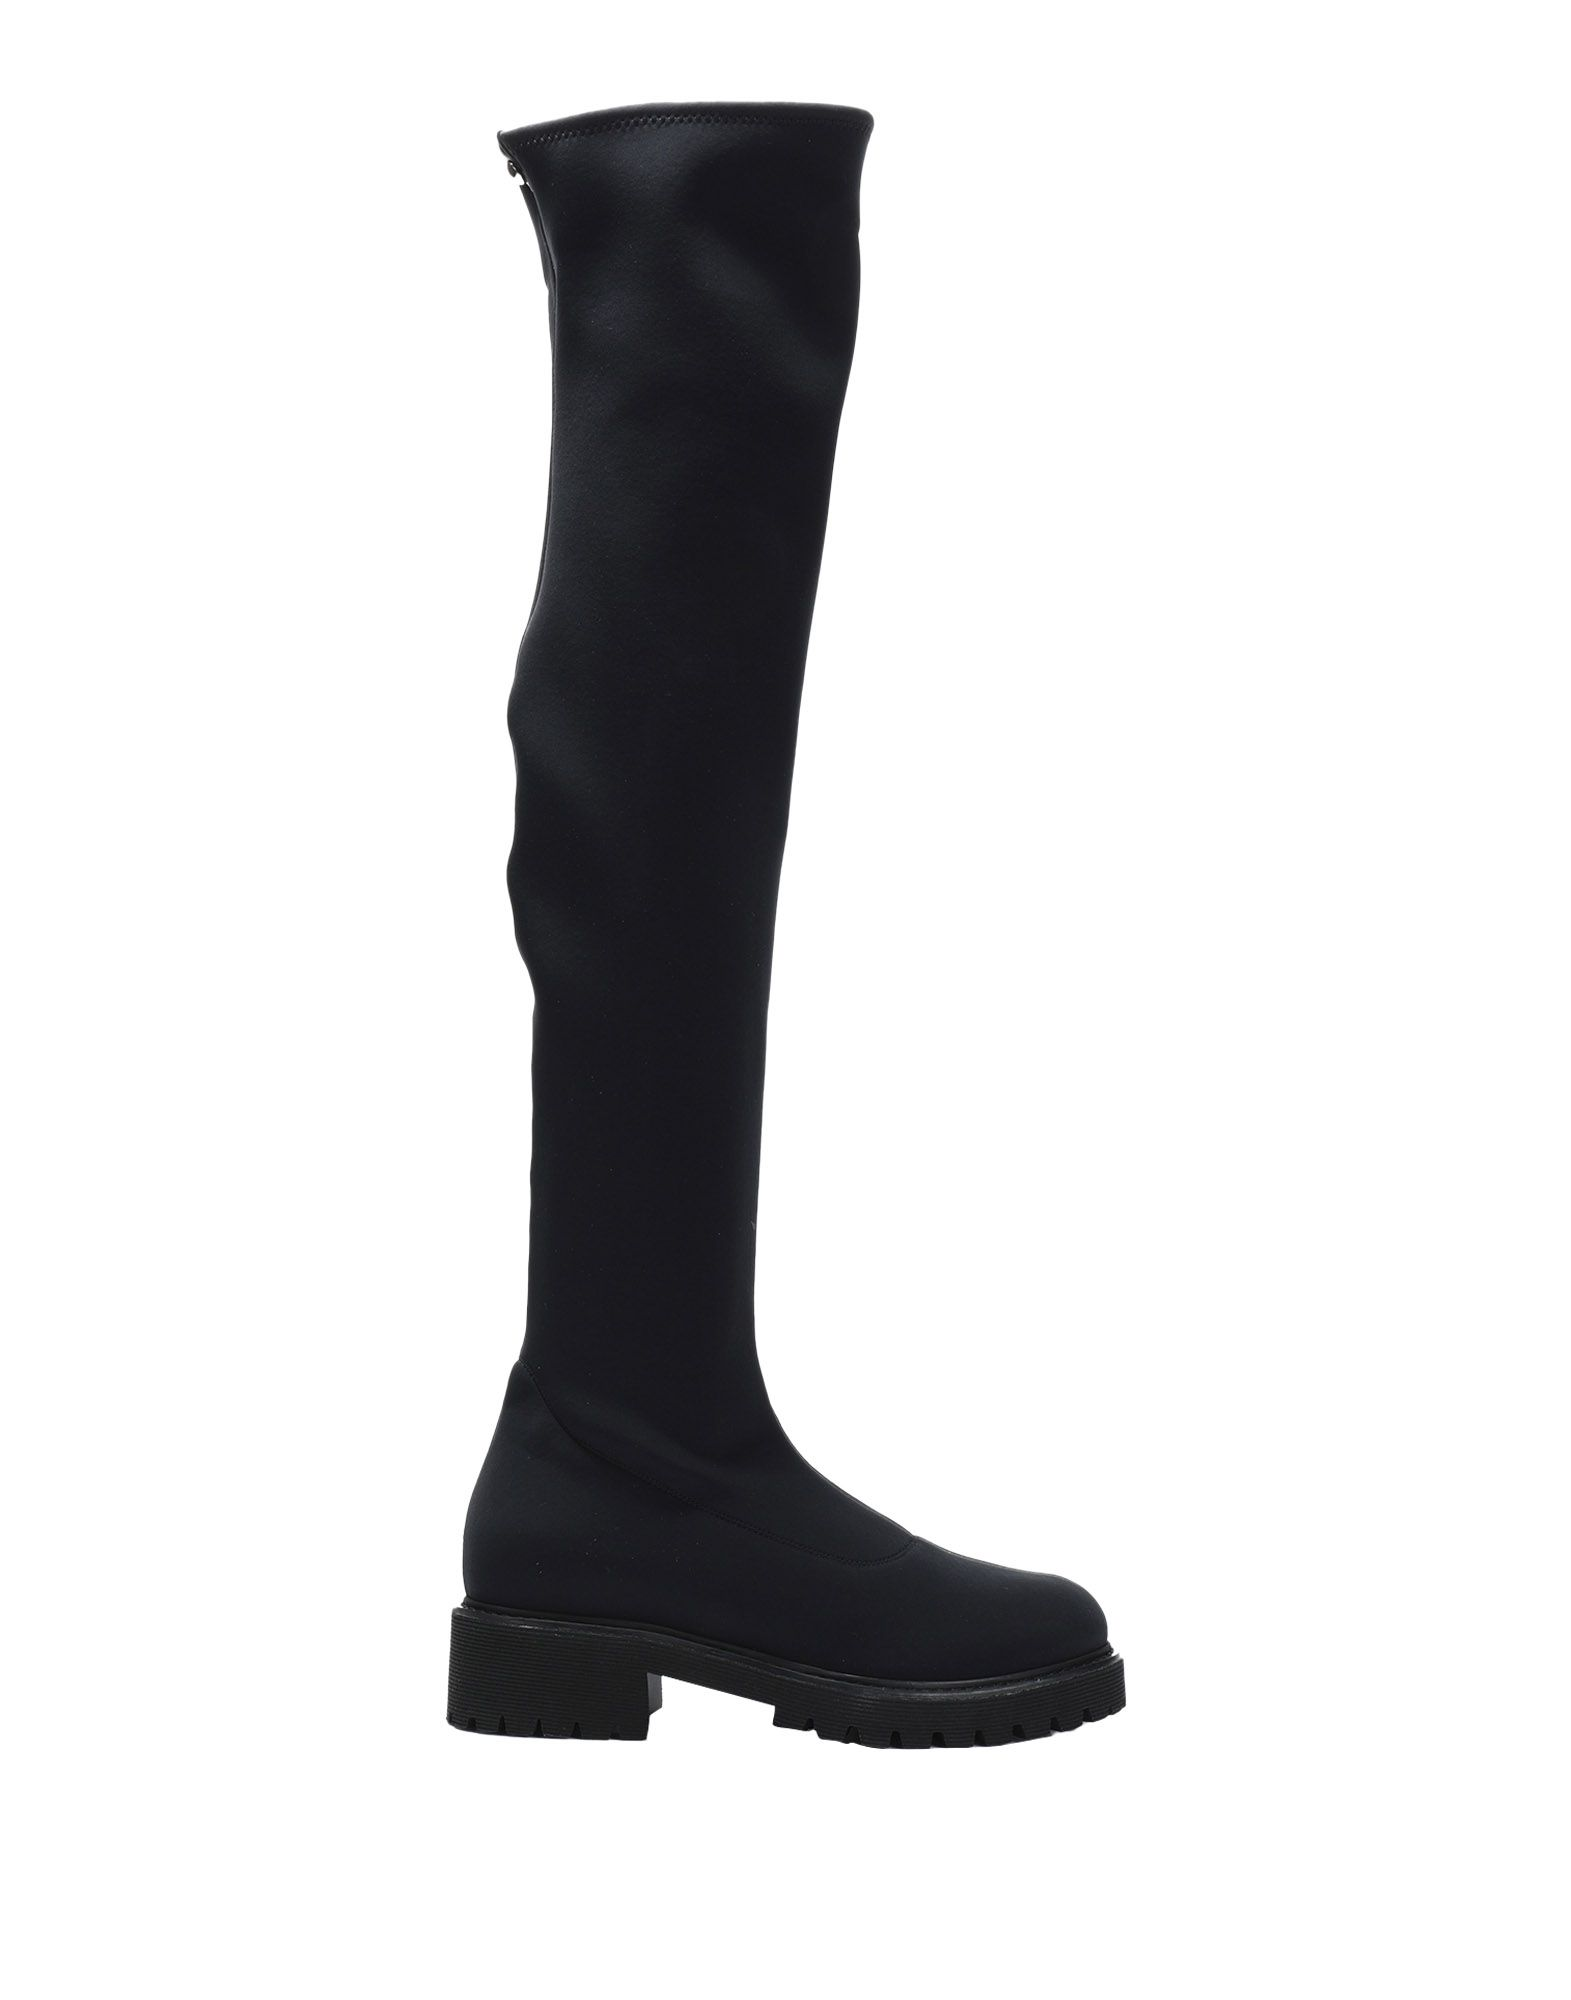 Giuseppe Zanotti Boots - Women Giuseppe  Zanotti Boots online on  Giuseppe United Kingdom - 11547134SV 839899